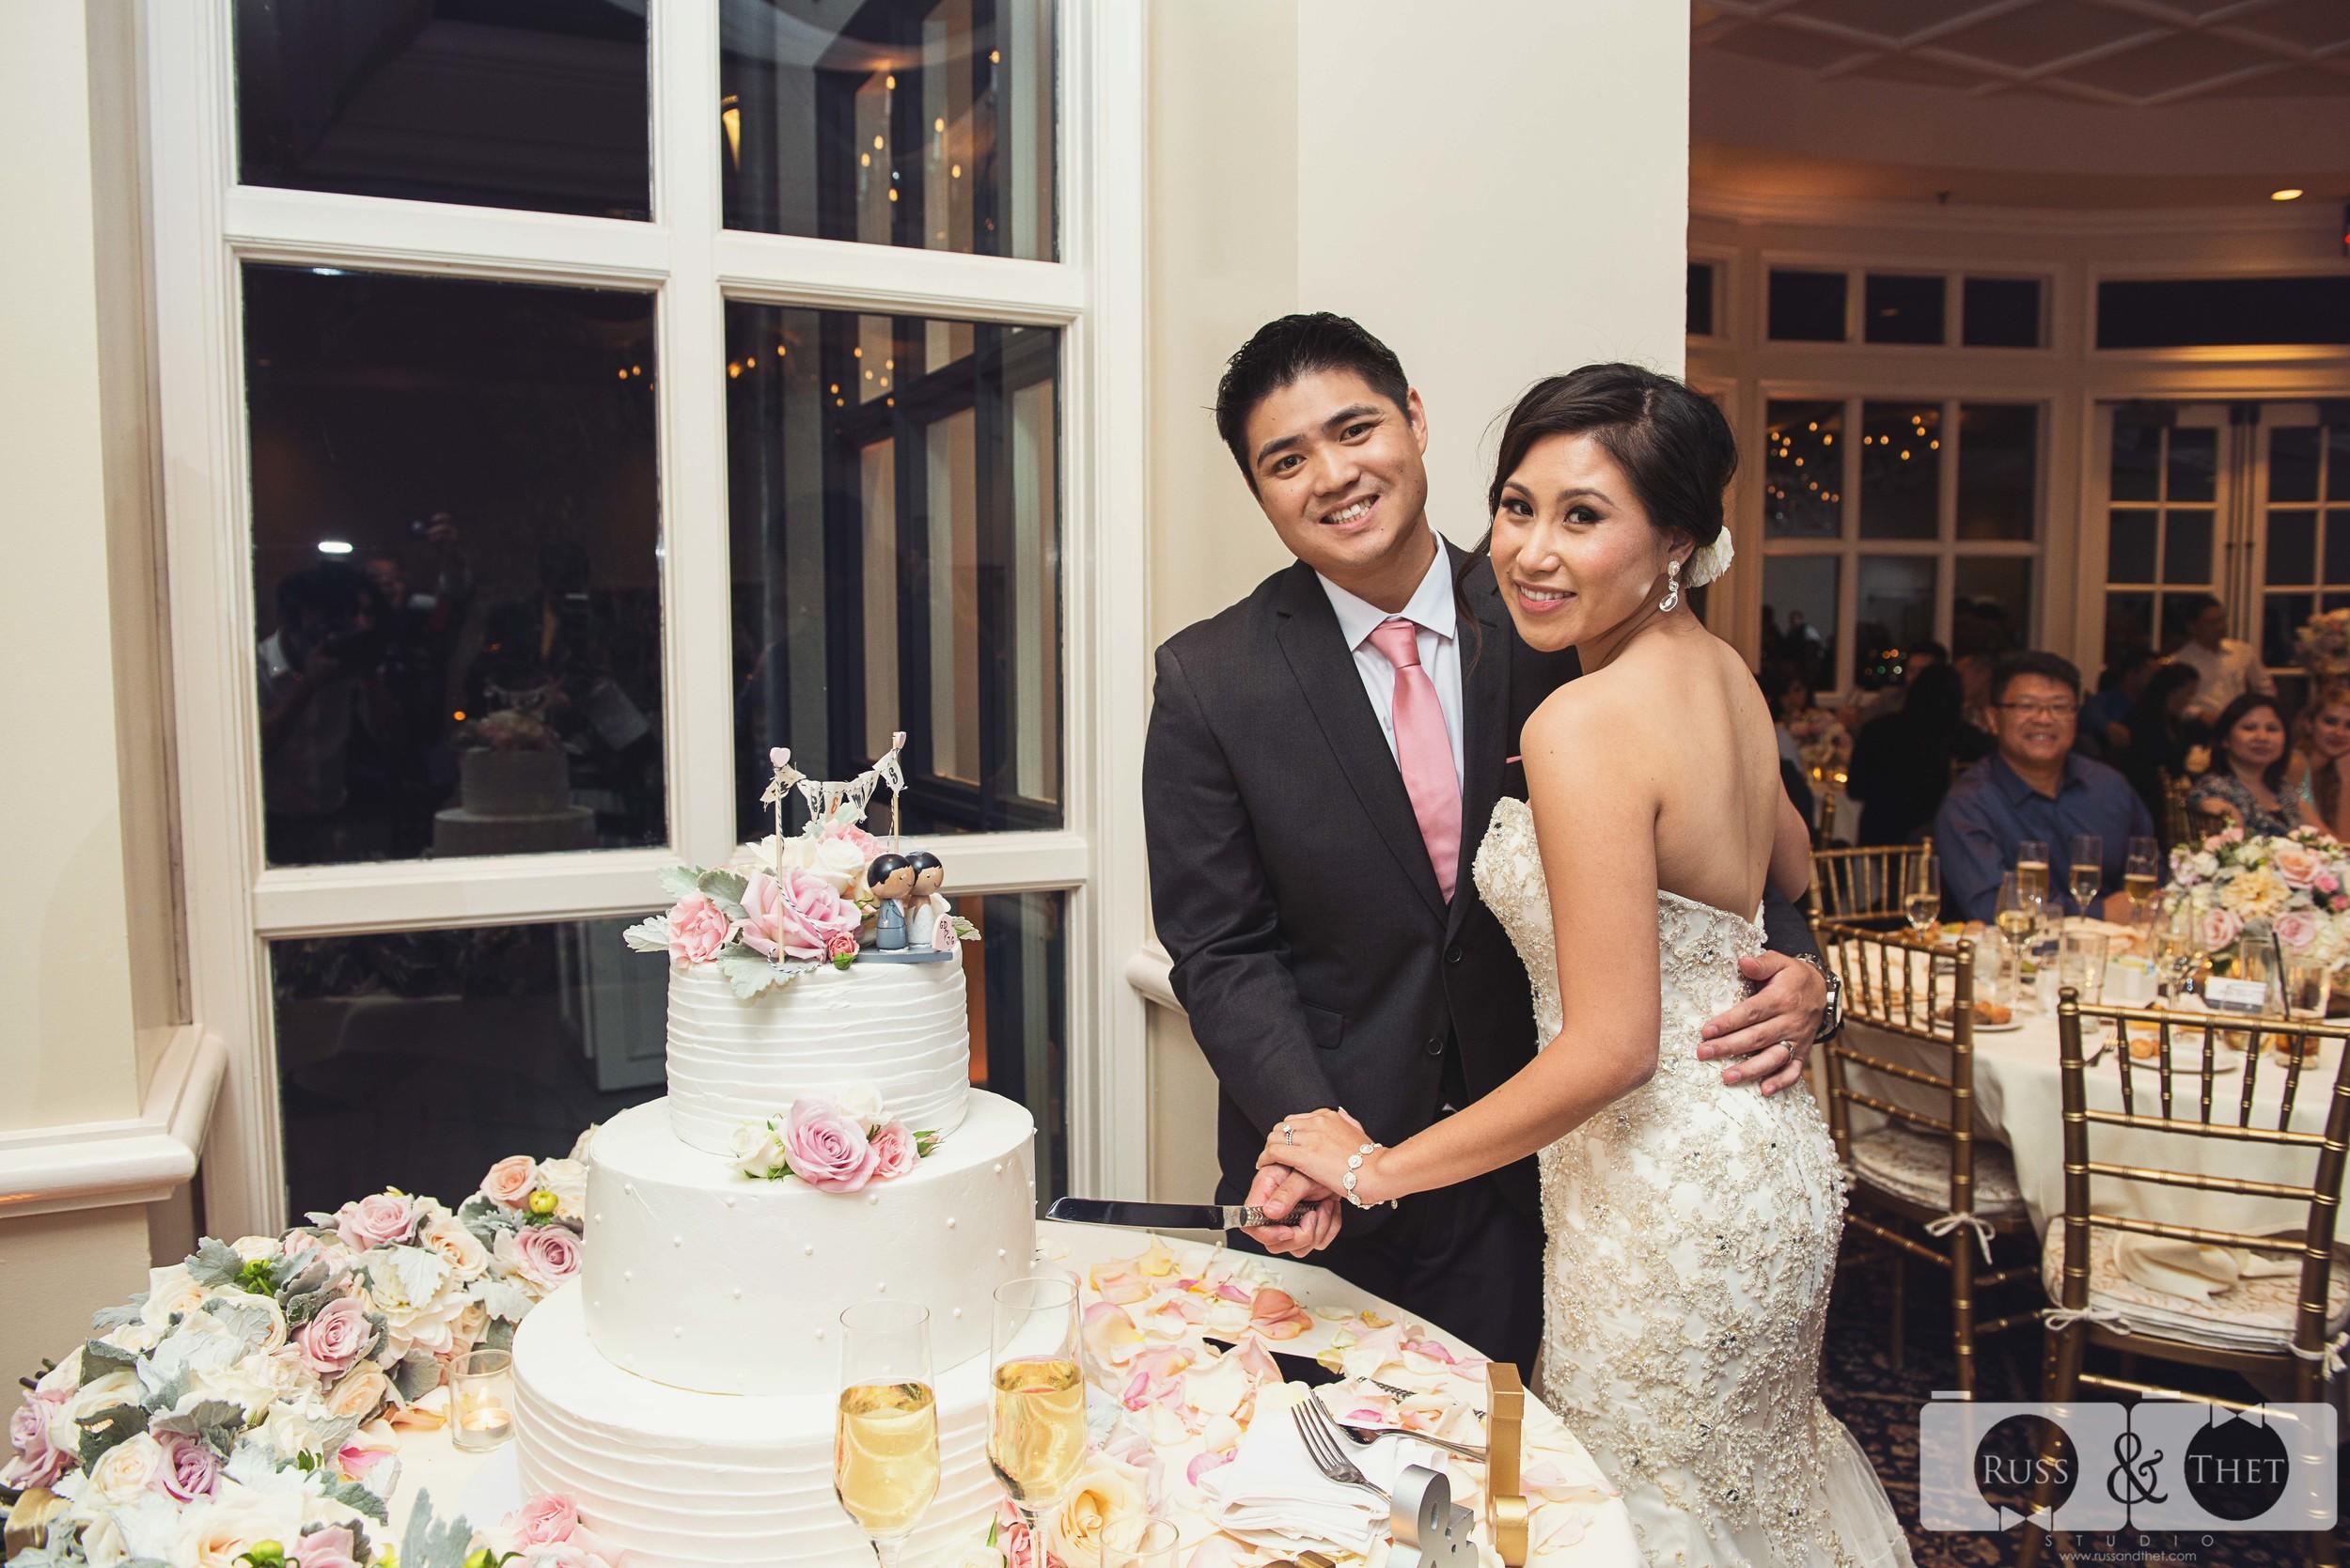 summit-house-fullerton-wedding-photographer-126.JPG